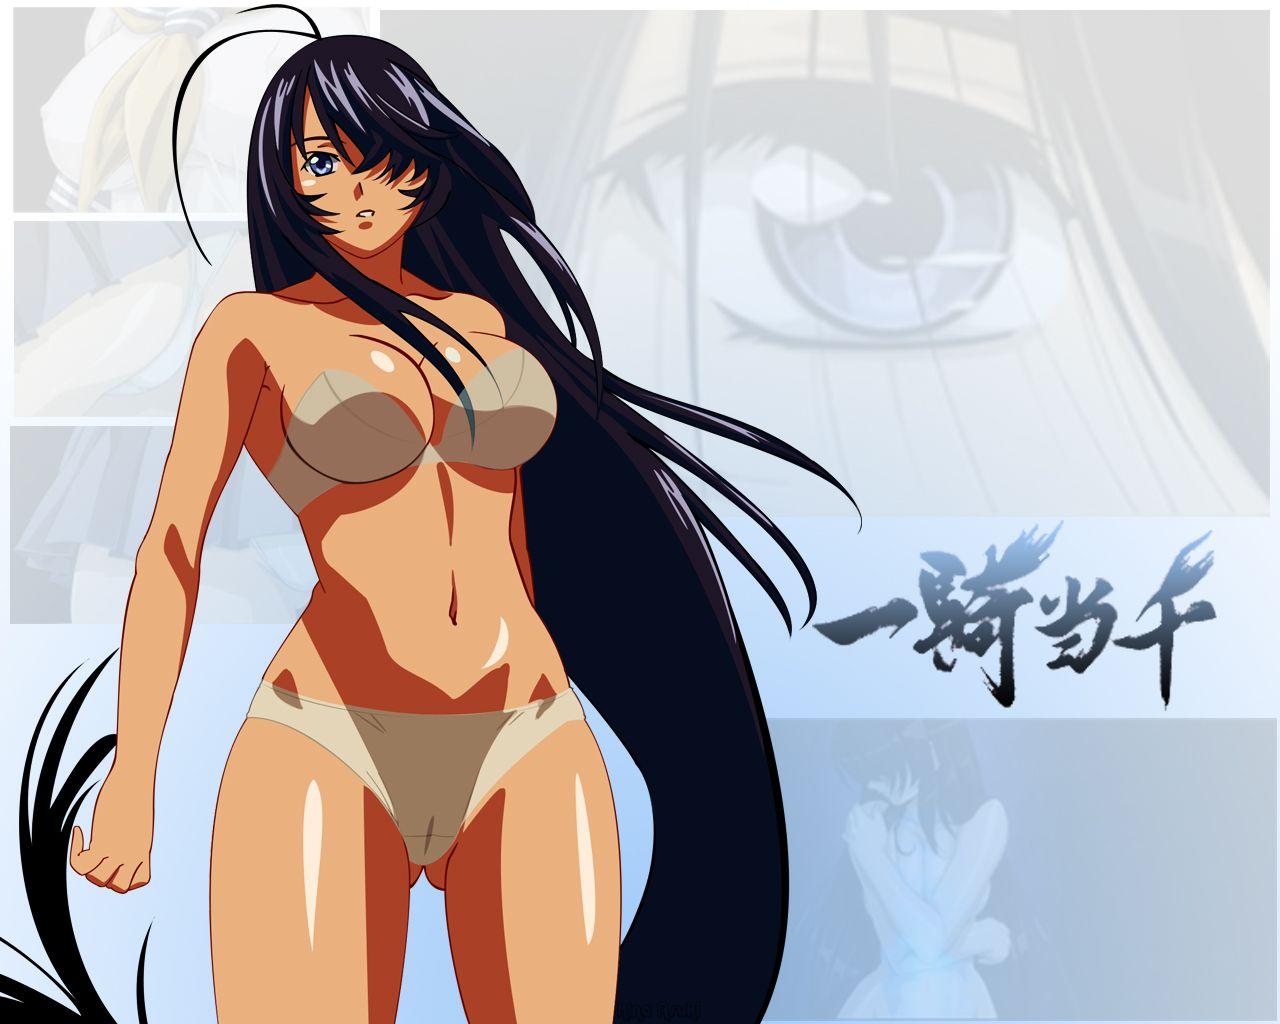 Ikkitosen dragon destiny hentai porn pics exploited photos